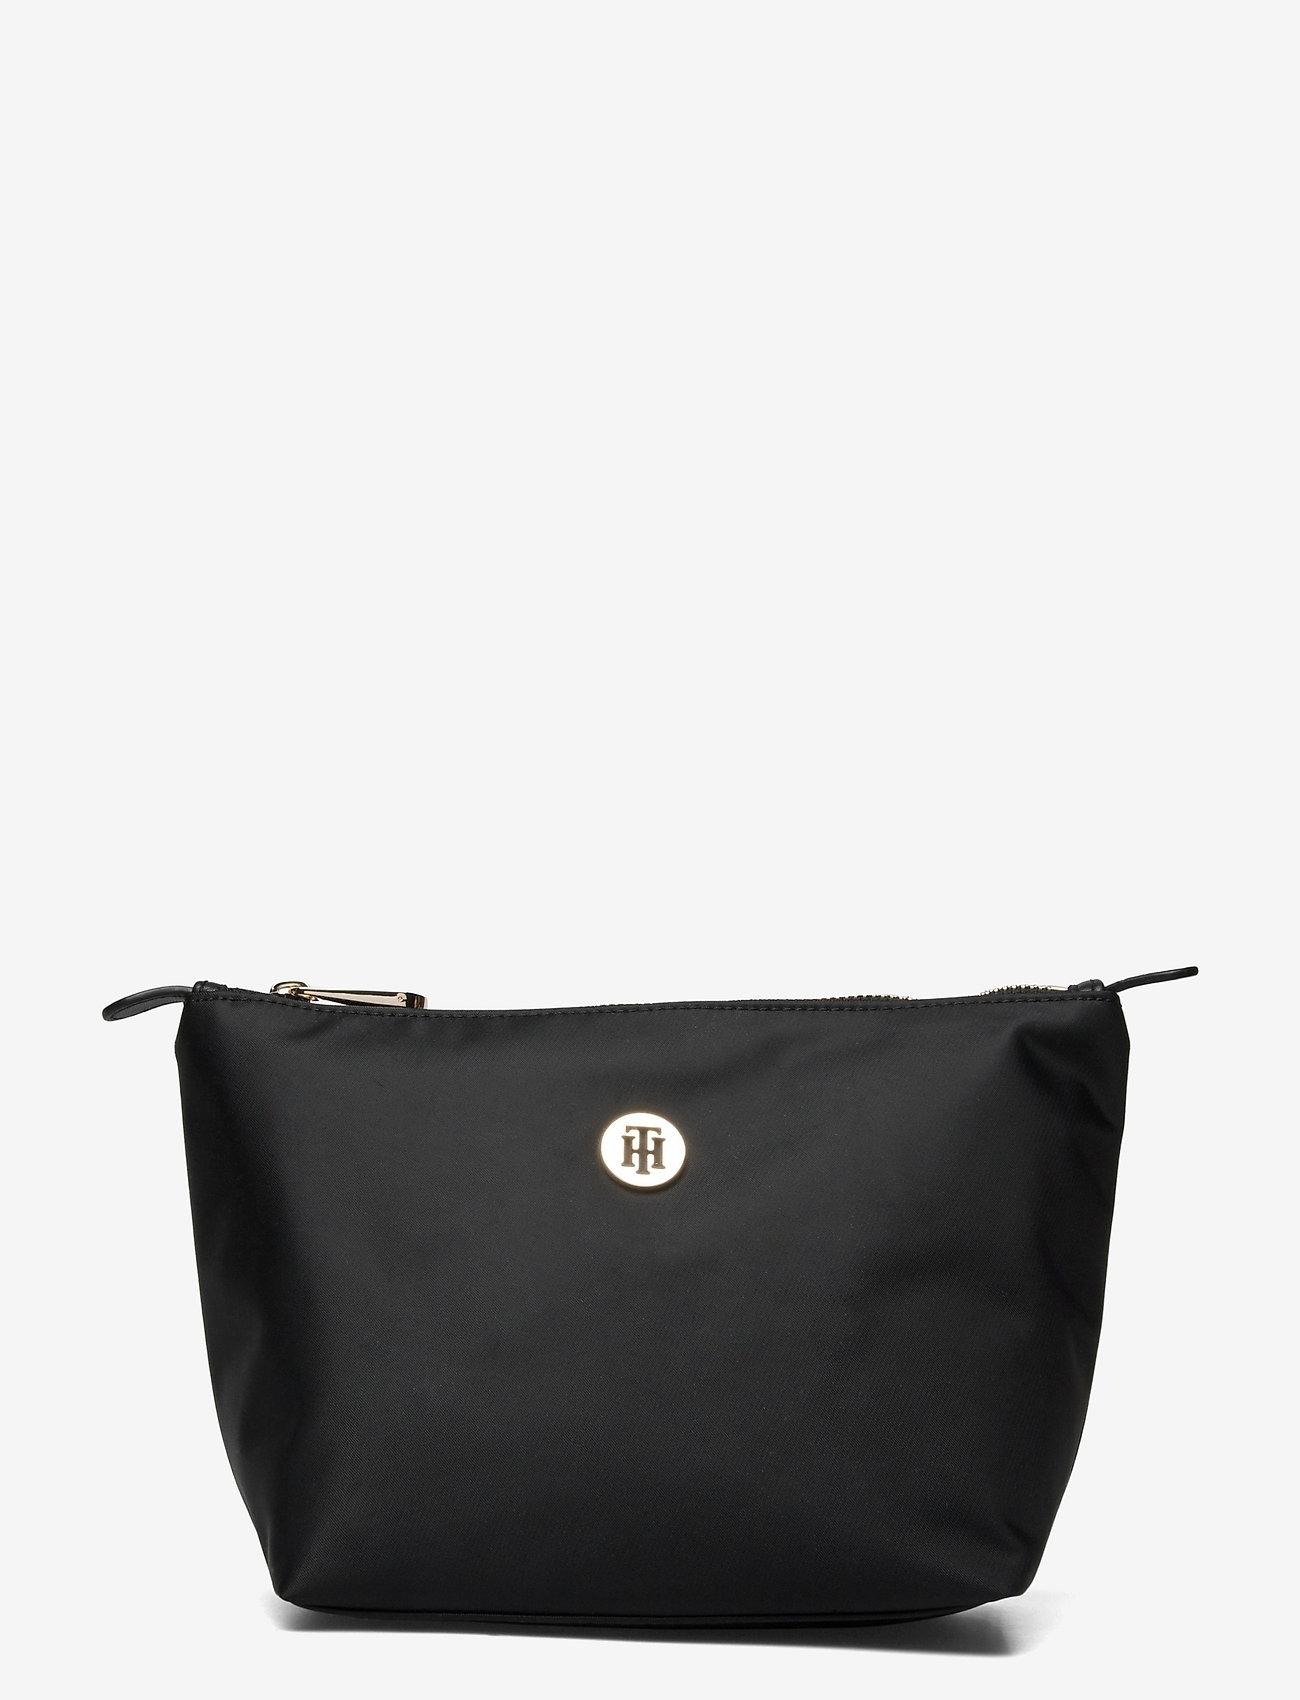 Tommy Hilfiger - POPPY WASHBAG - cosmetic bags - black - 0